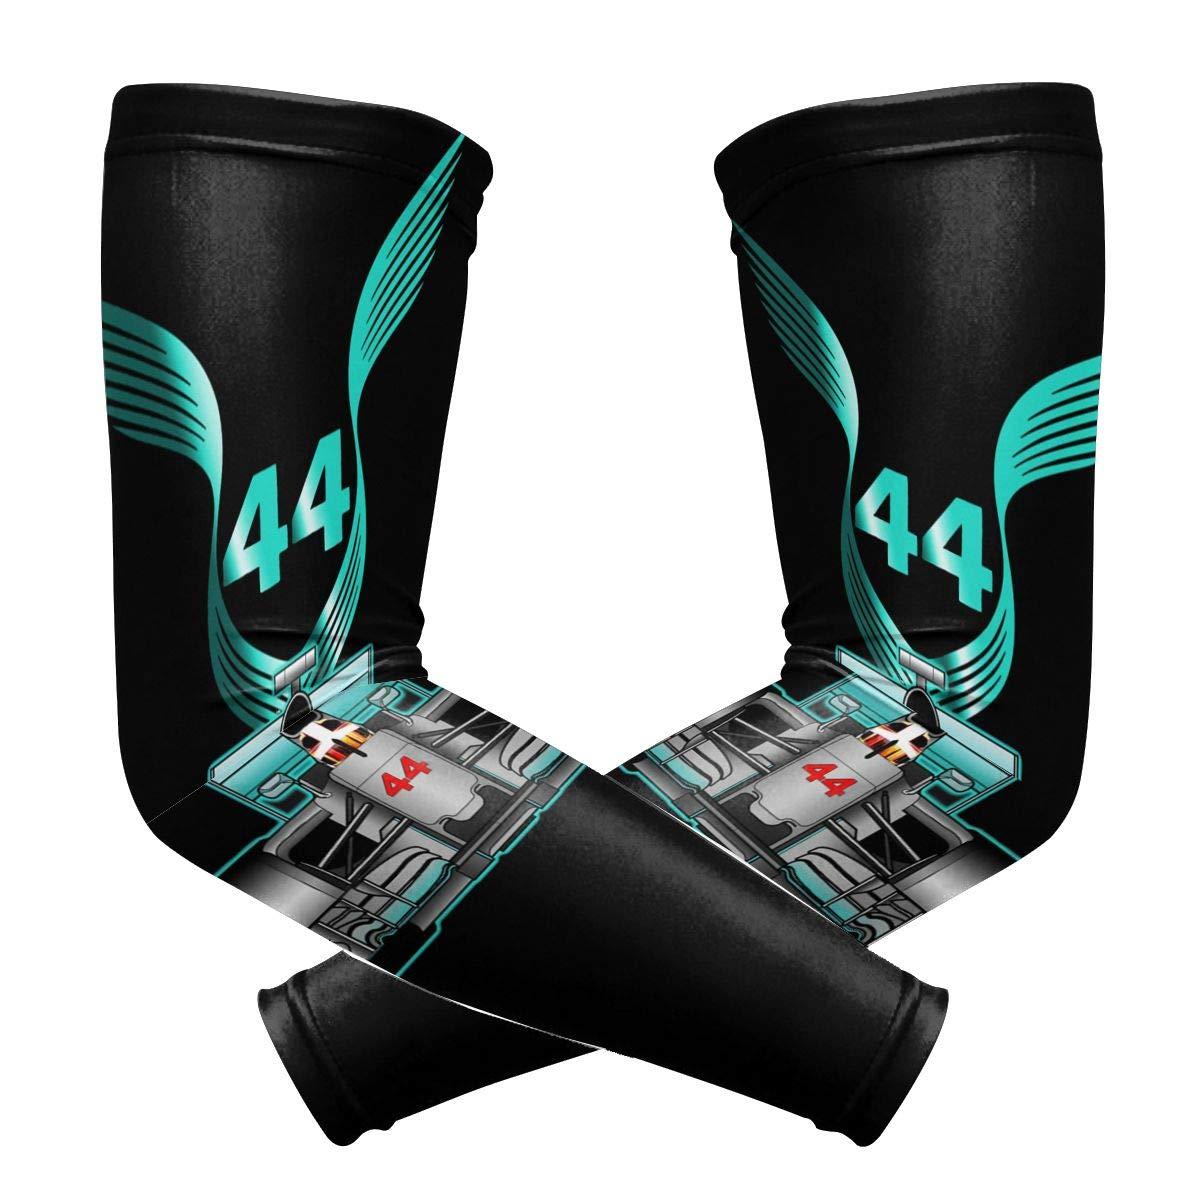 KANATSIU Racing Driver Champio Lewis Hamilton 44 Arm Sleeves,High Performance Athletic Armwarmer Sun Protection Sleeve,1 Pair